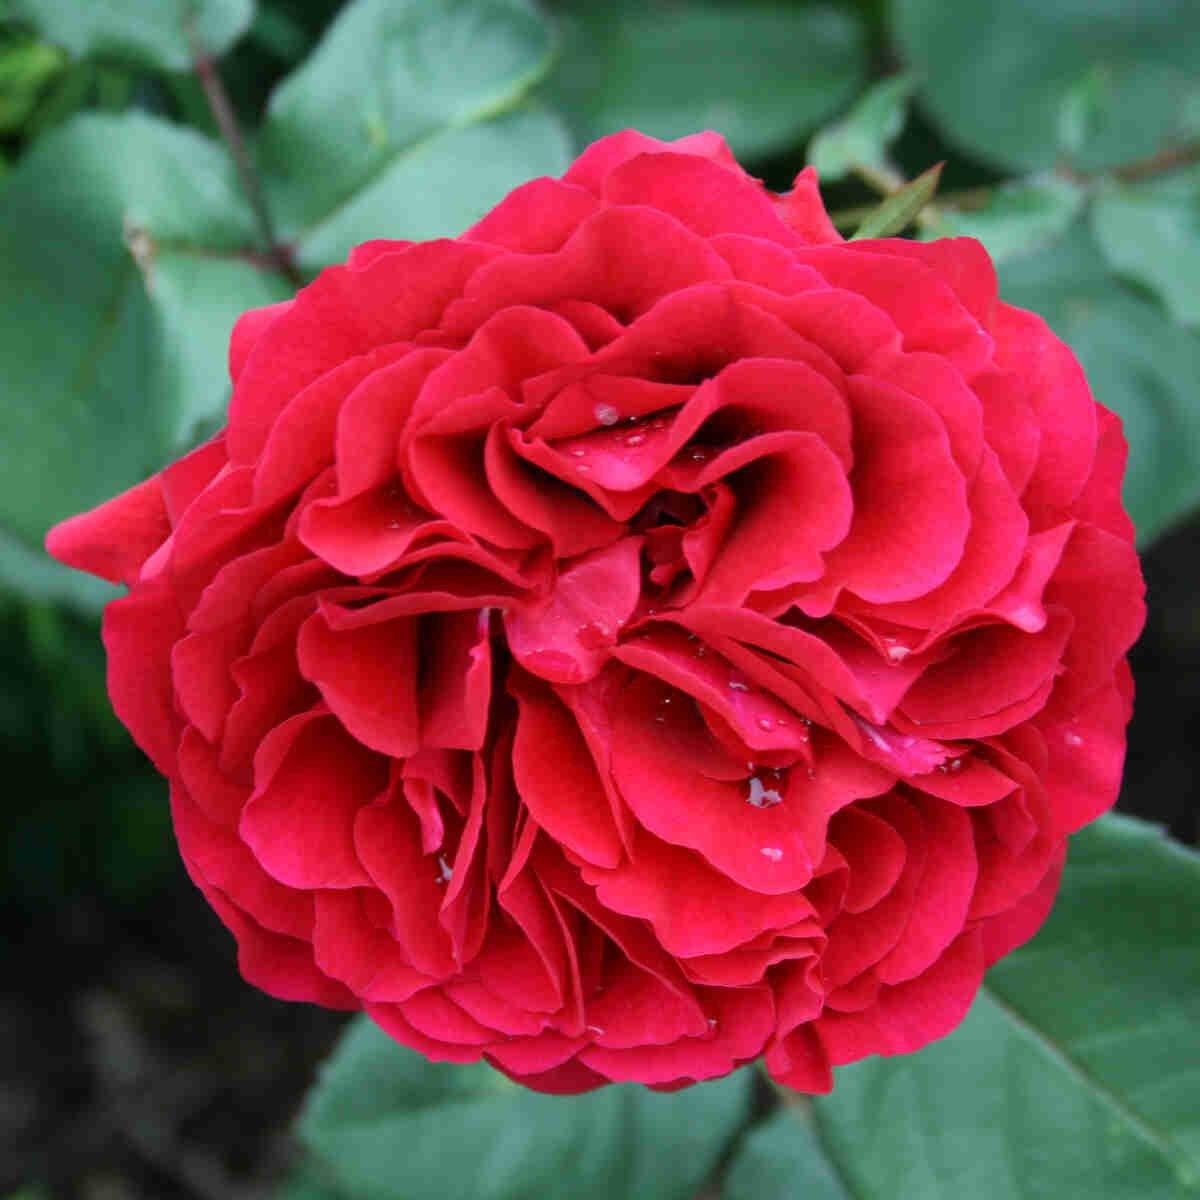 Rose 'Nadia Renaissance'